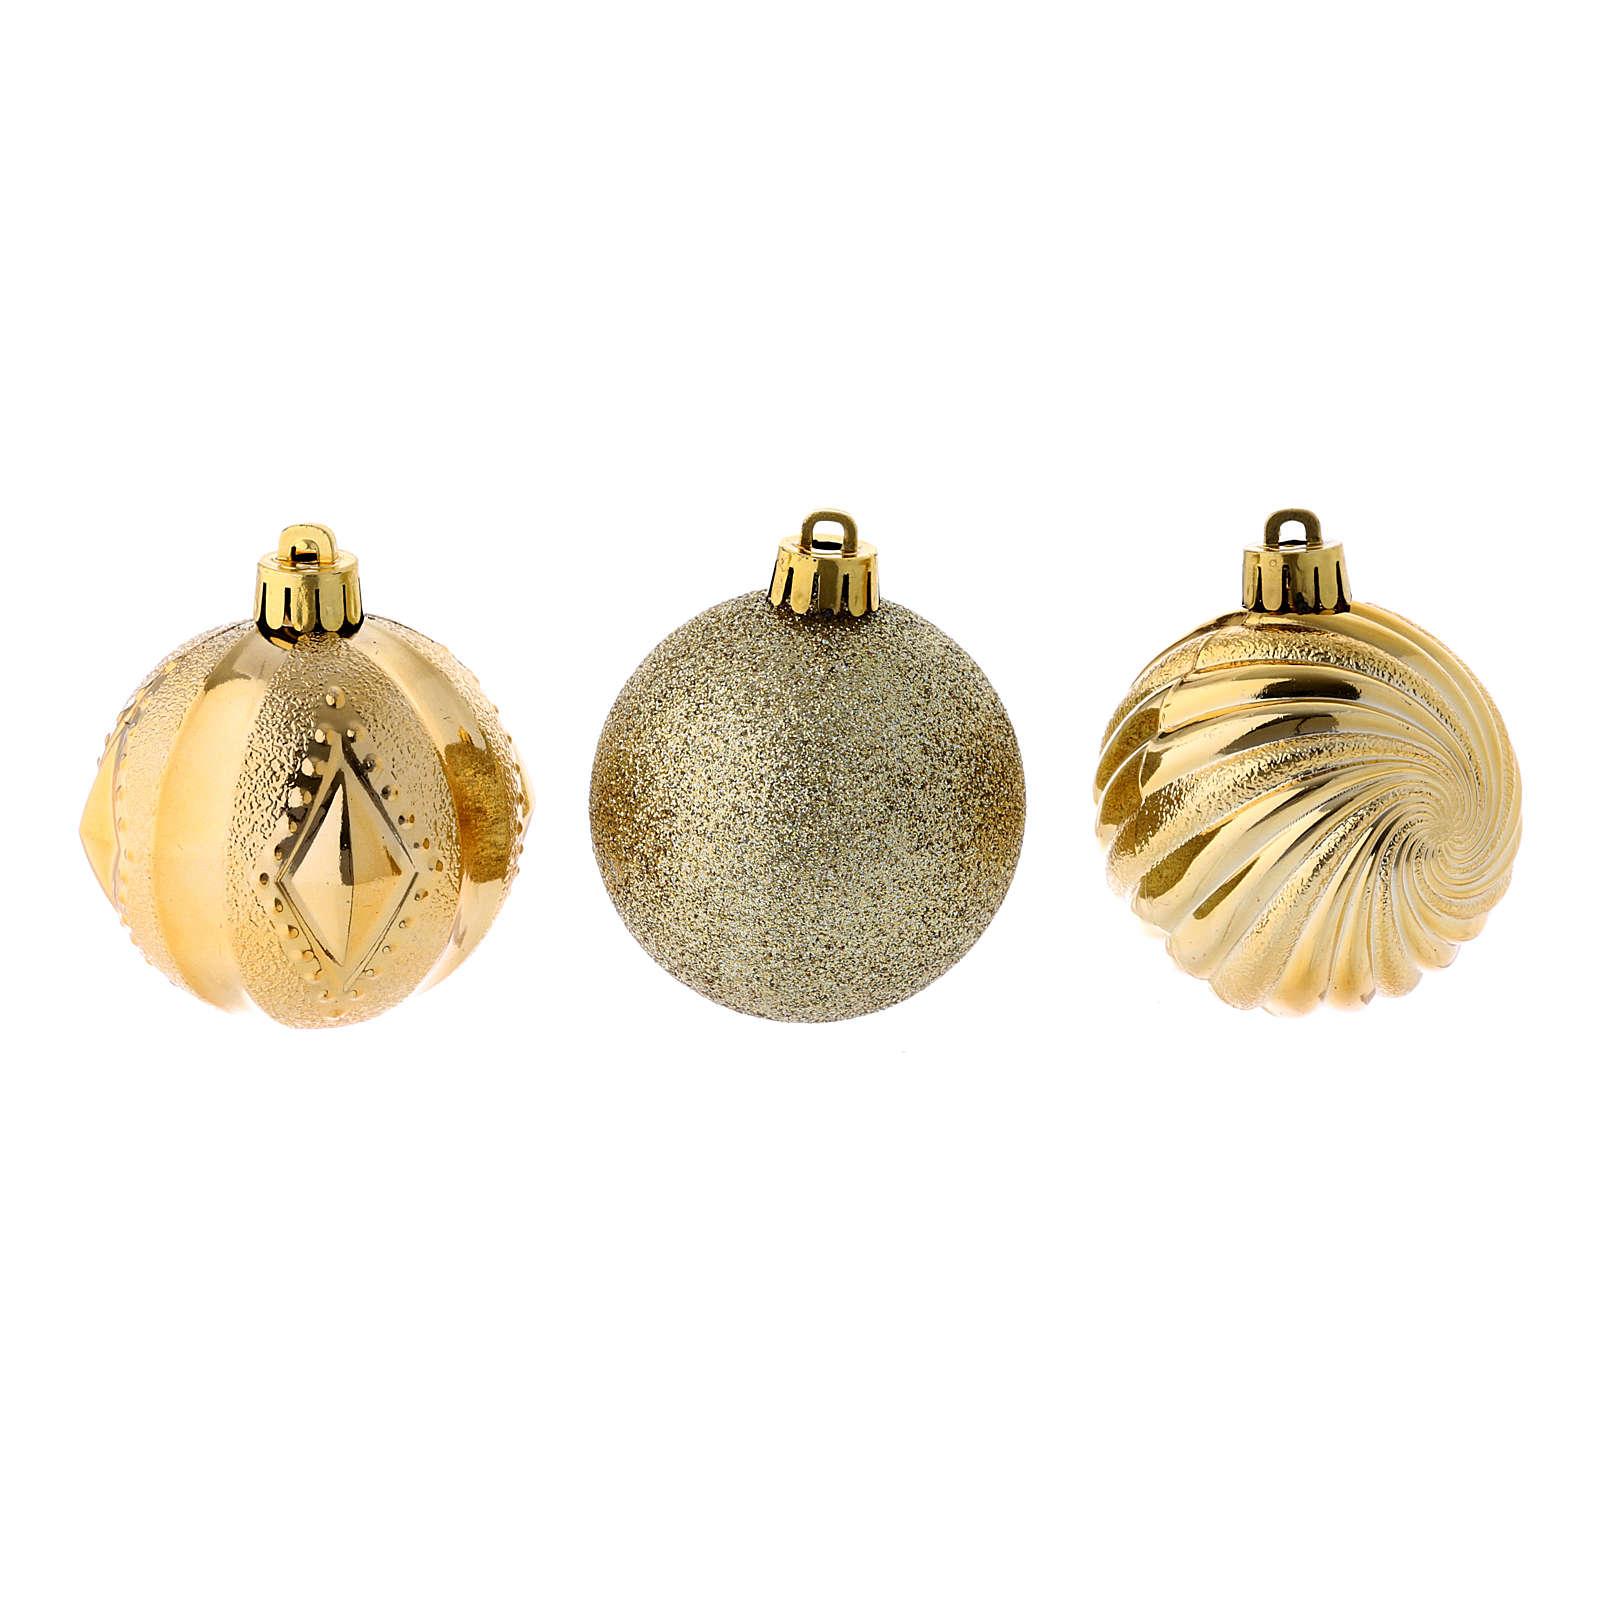 Christmas bauble 60 mm gold, 12 pcs 4